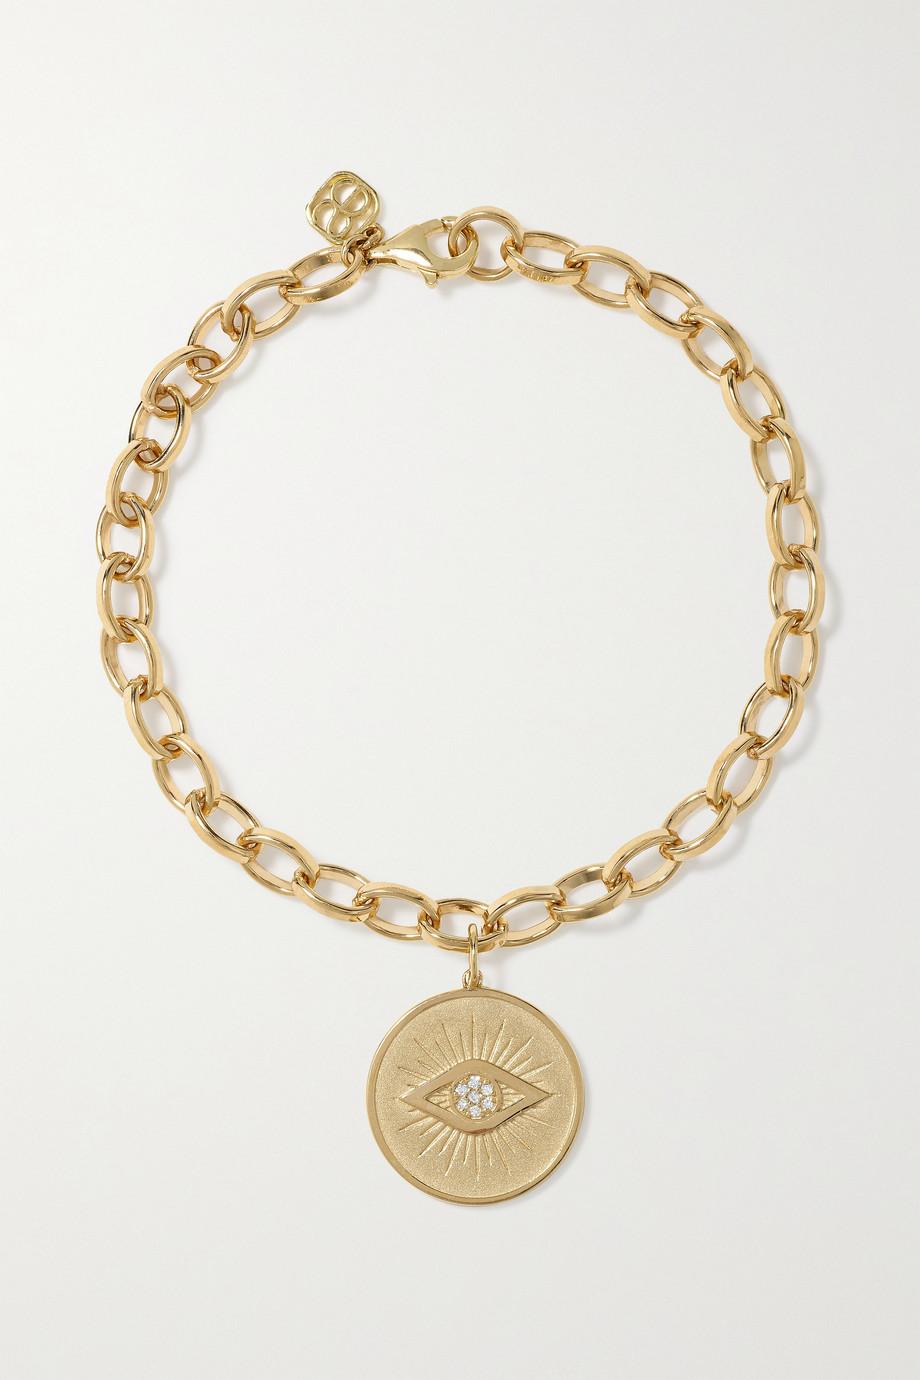 Sydney Evan Evil Eye Coin 14-karat gold diamond bracelet